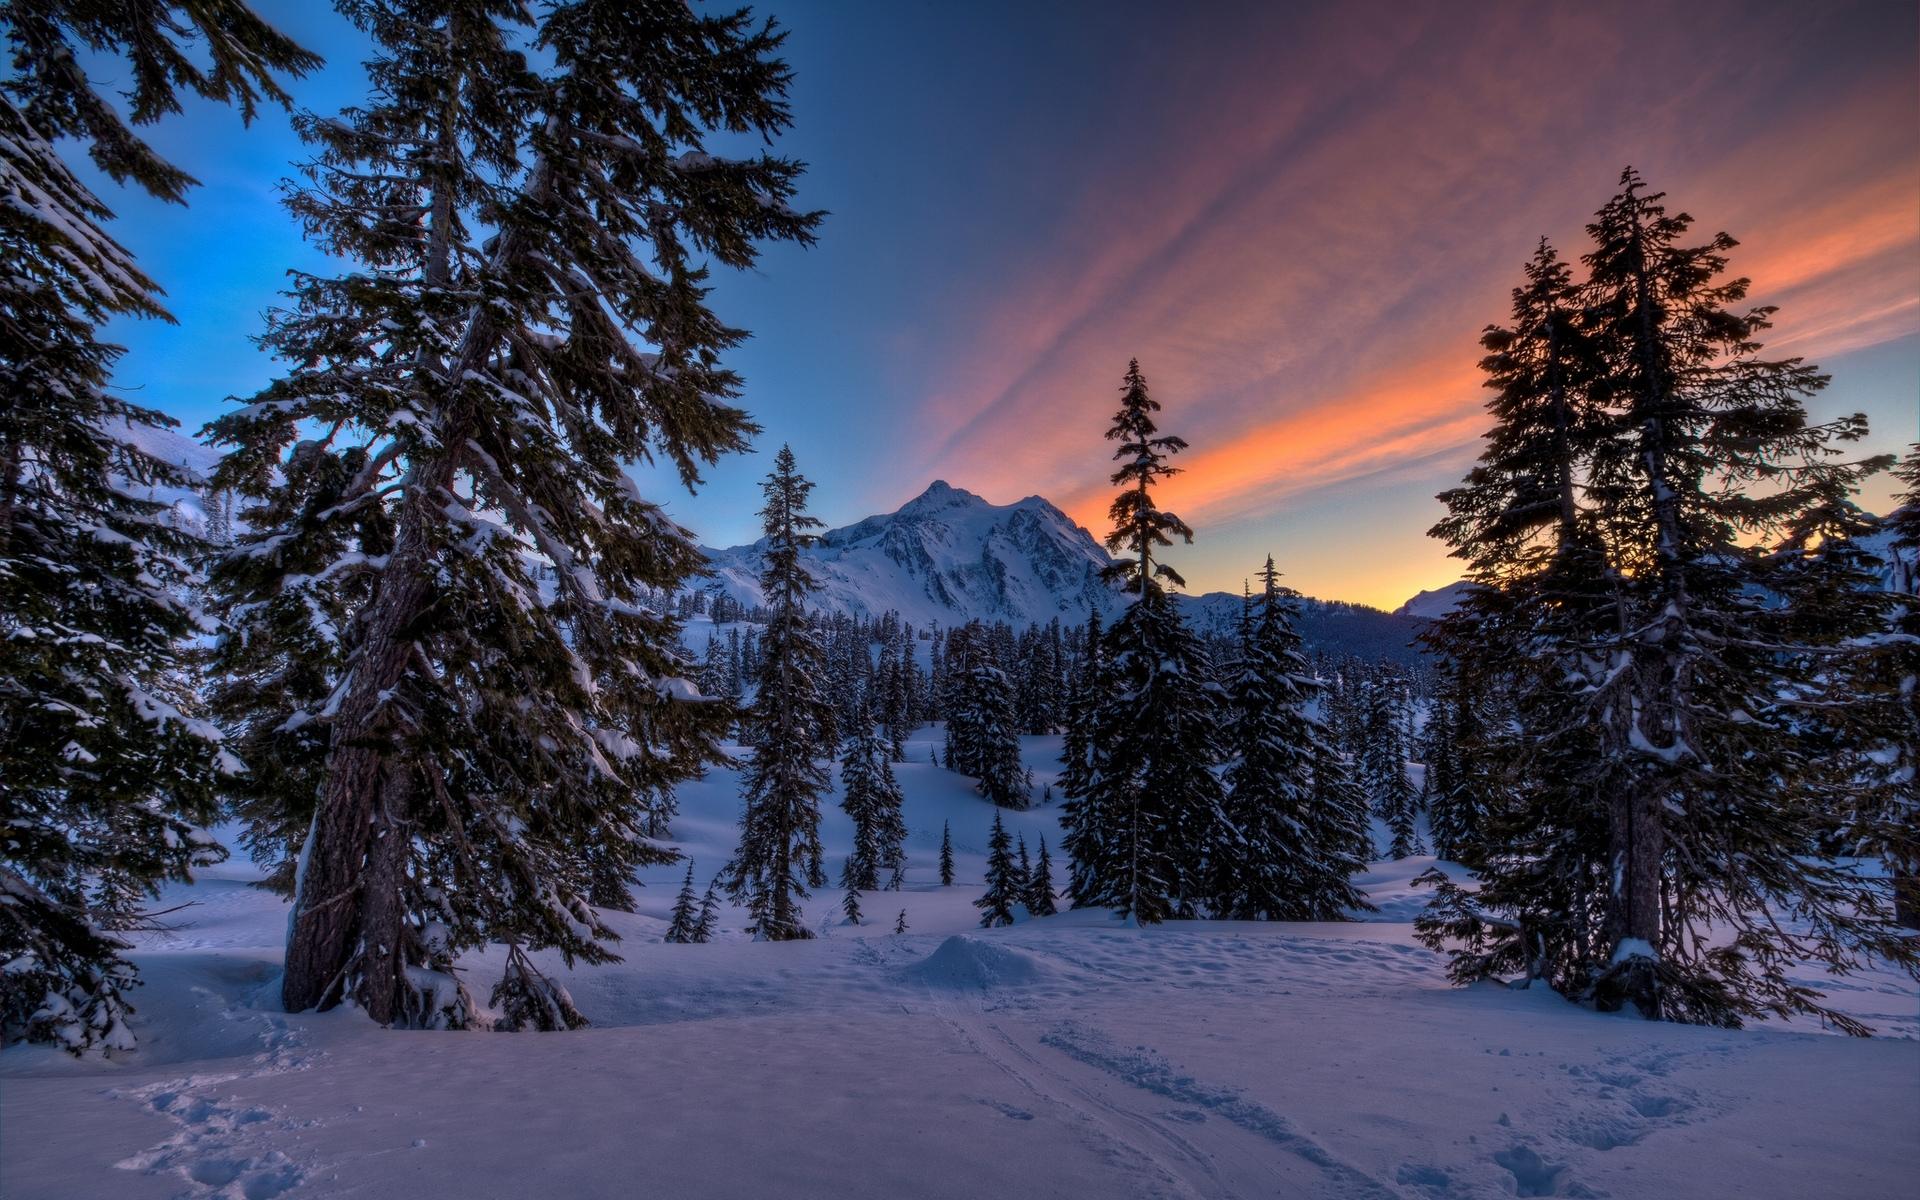 Snowy pine trees wallpaper   1398171 1920x1200